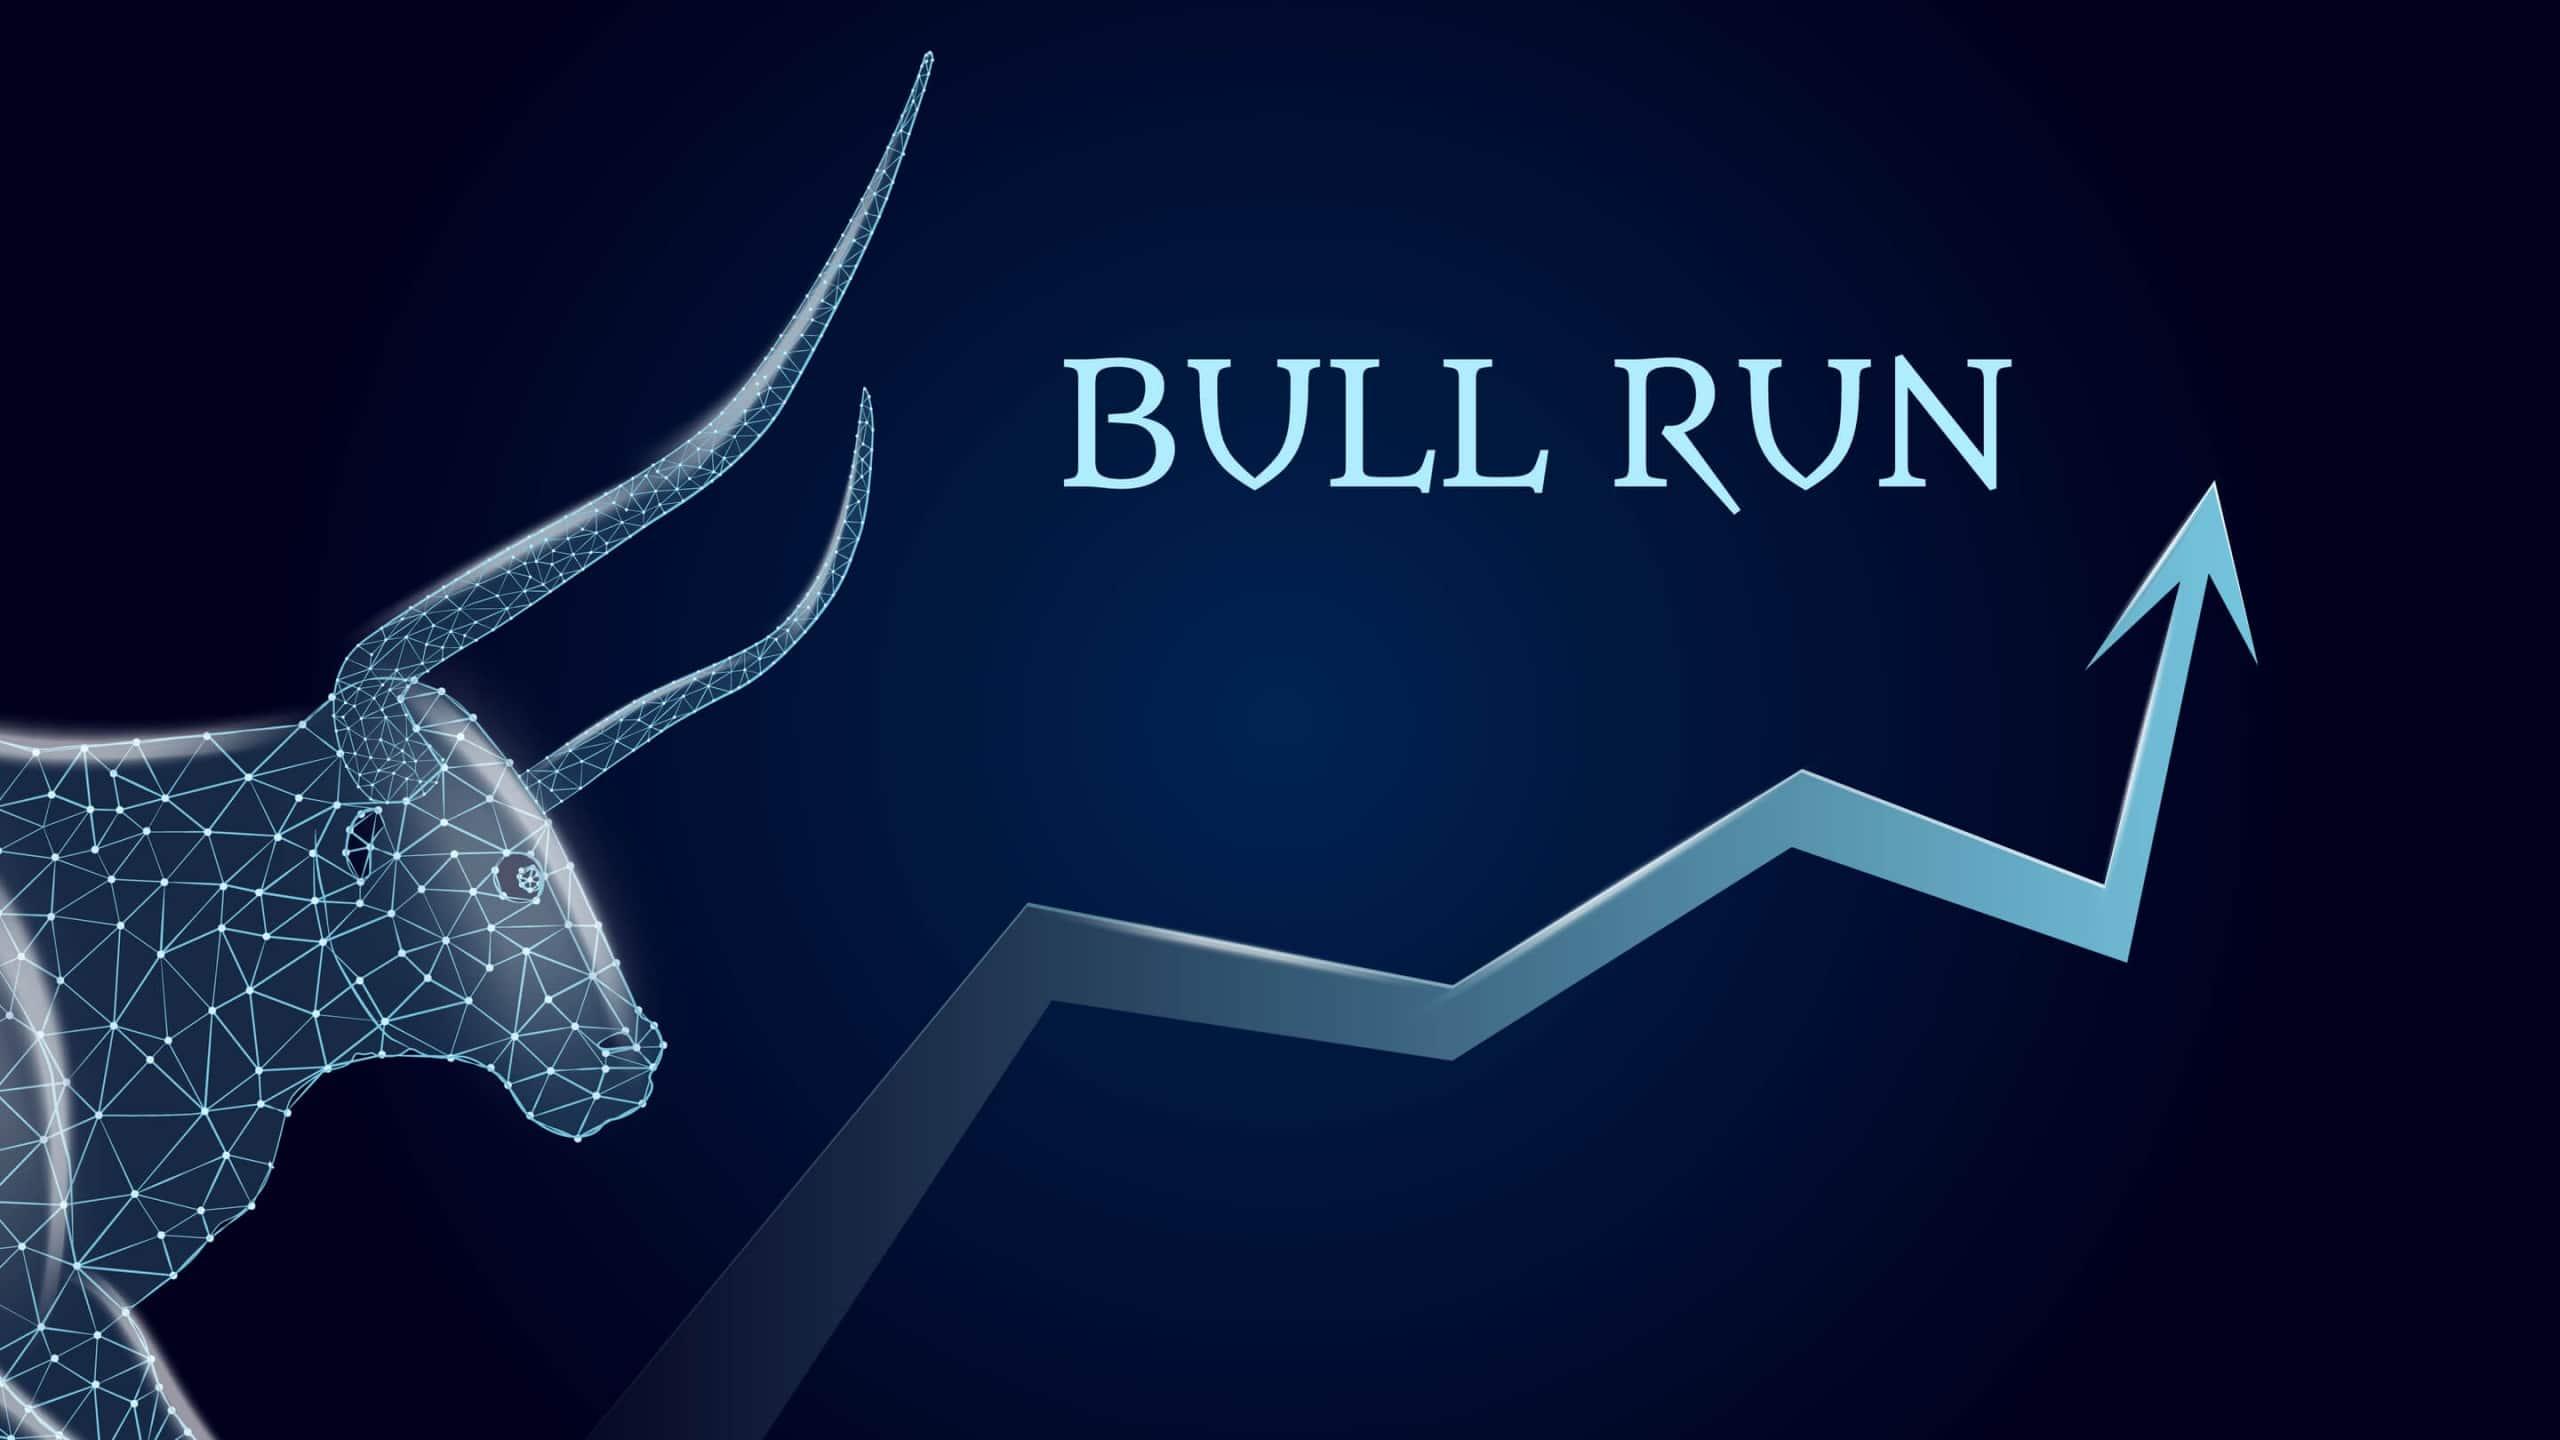 A big bull market run